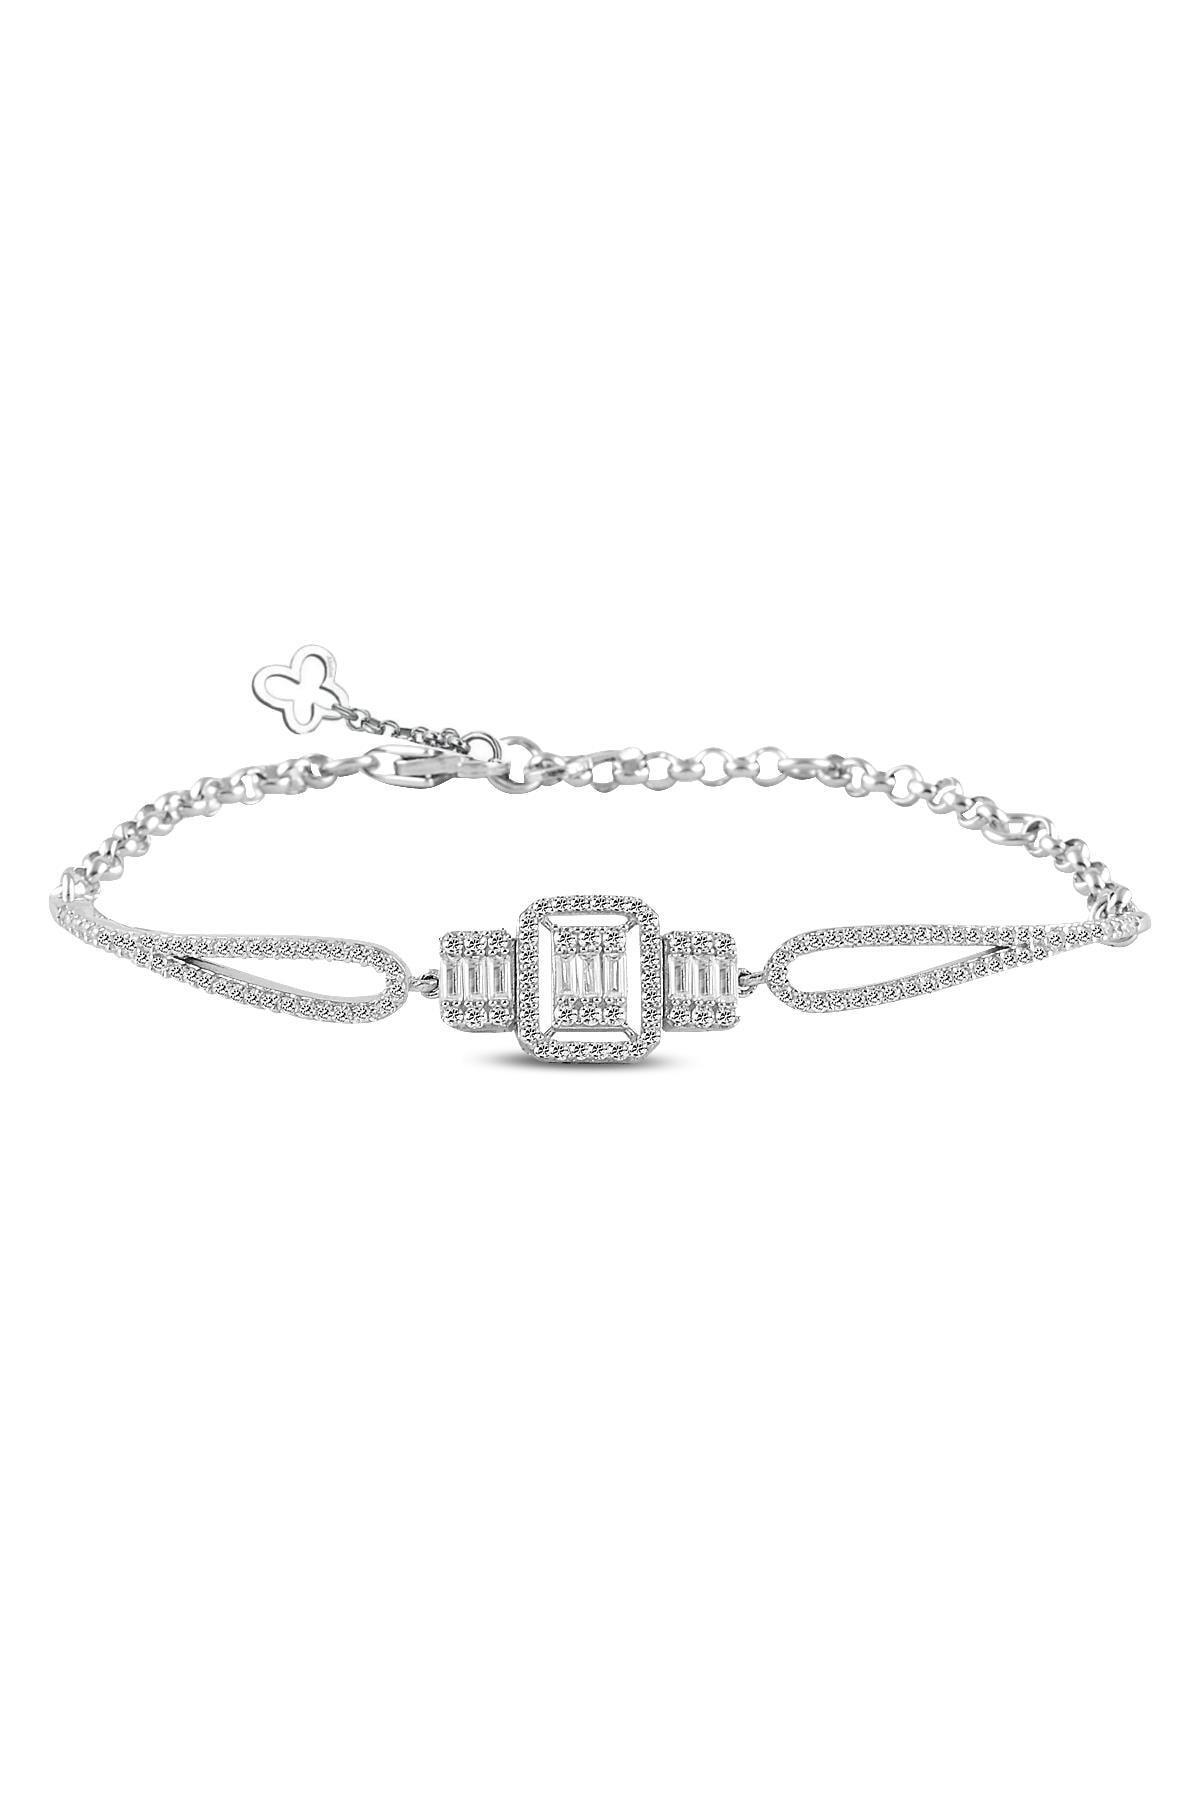 Söğütlü Silver Gümüş  Rodyumlu Baget Taşlı Bilezik